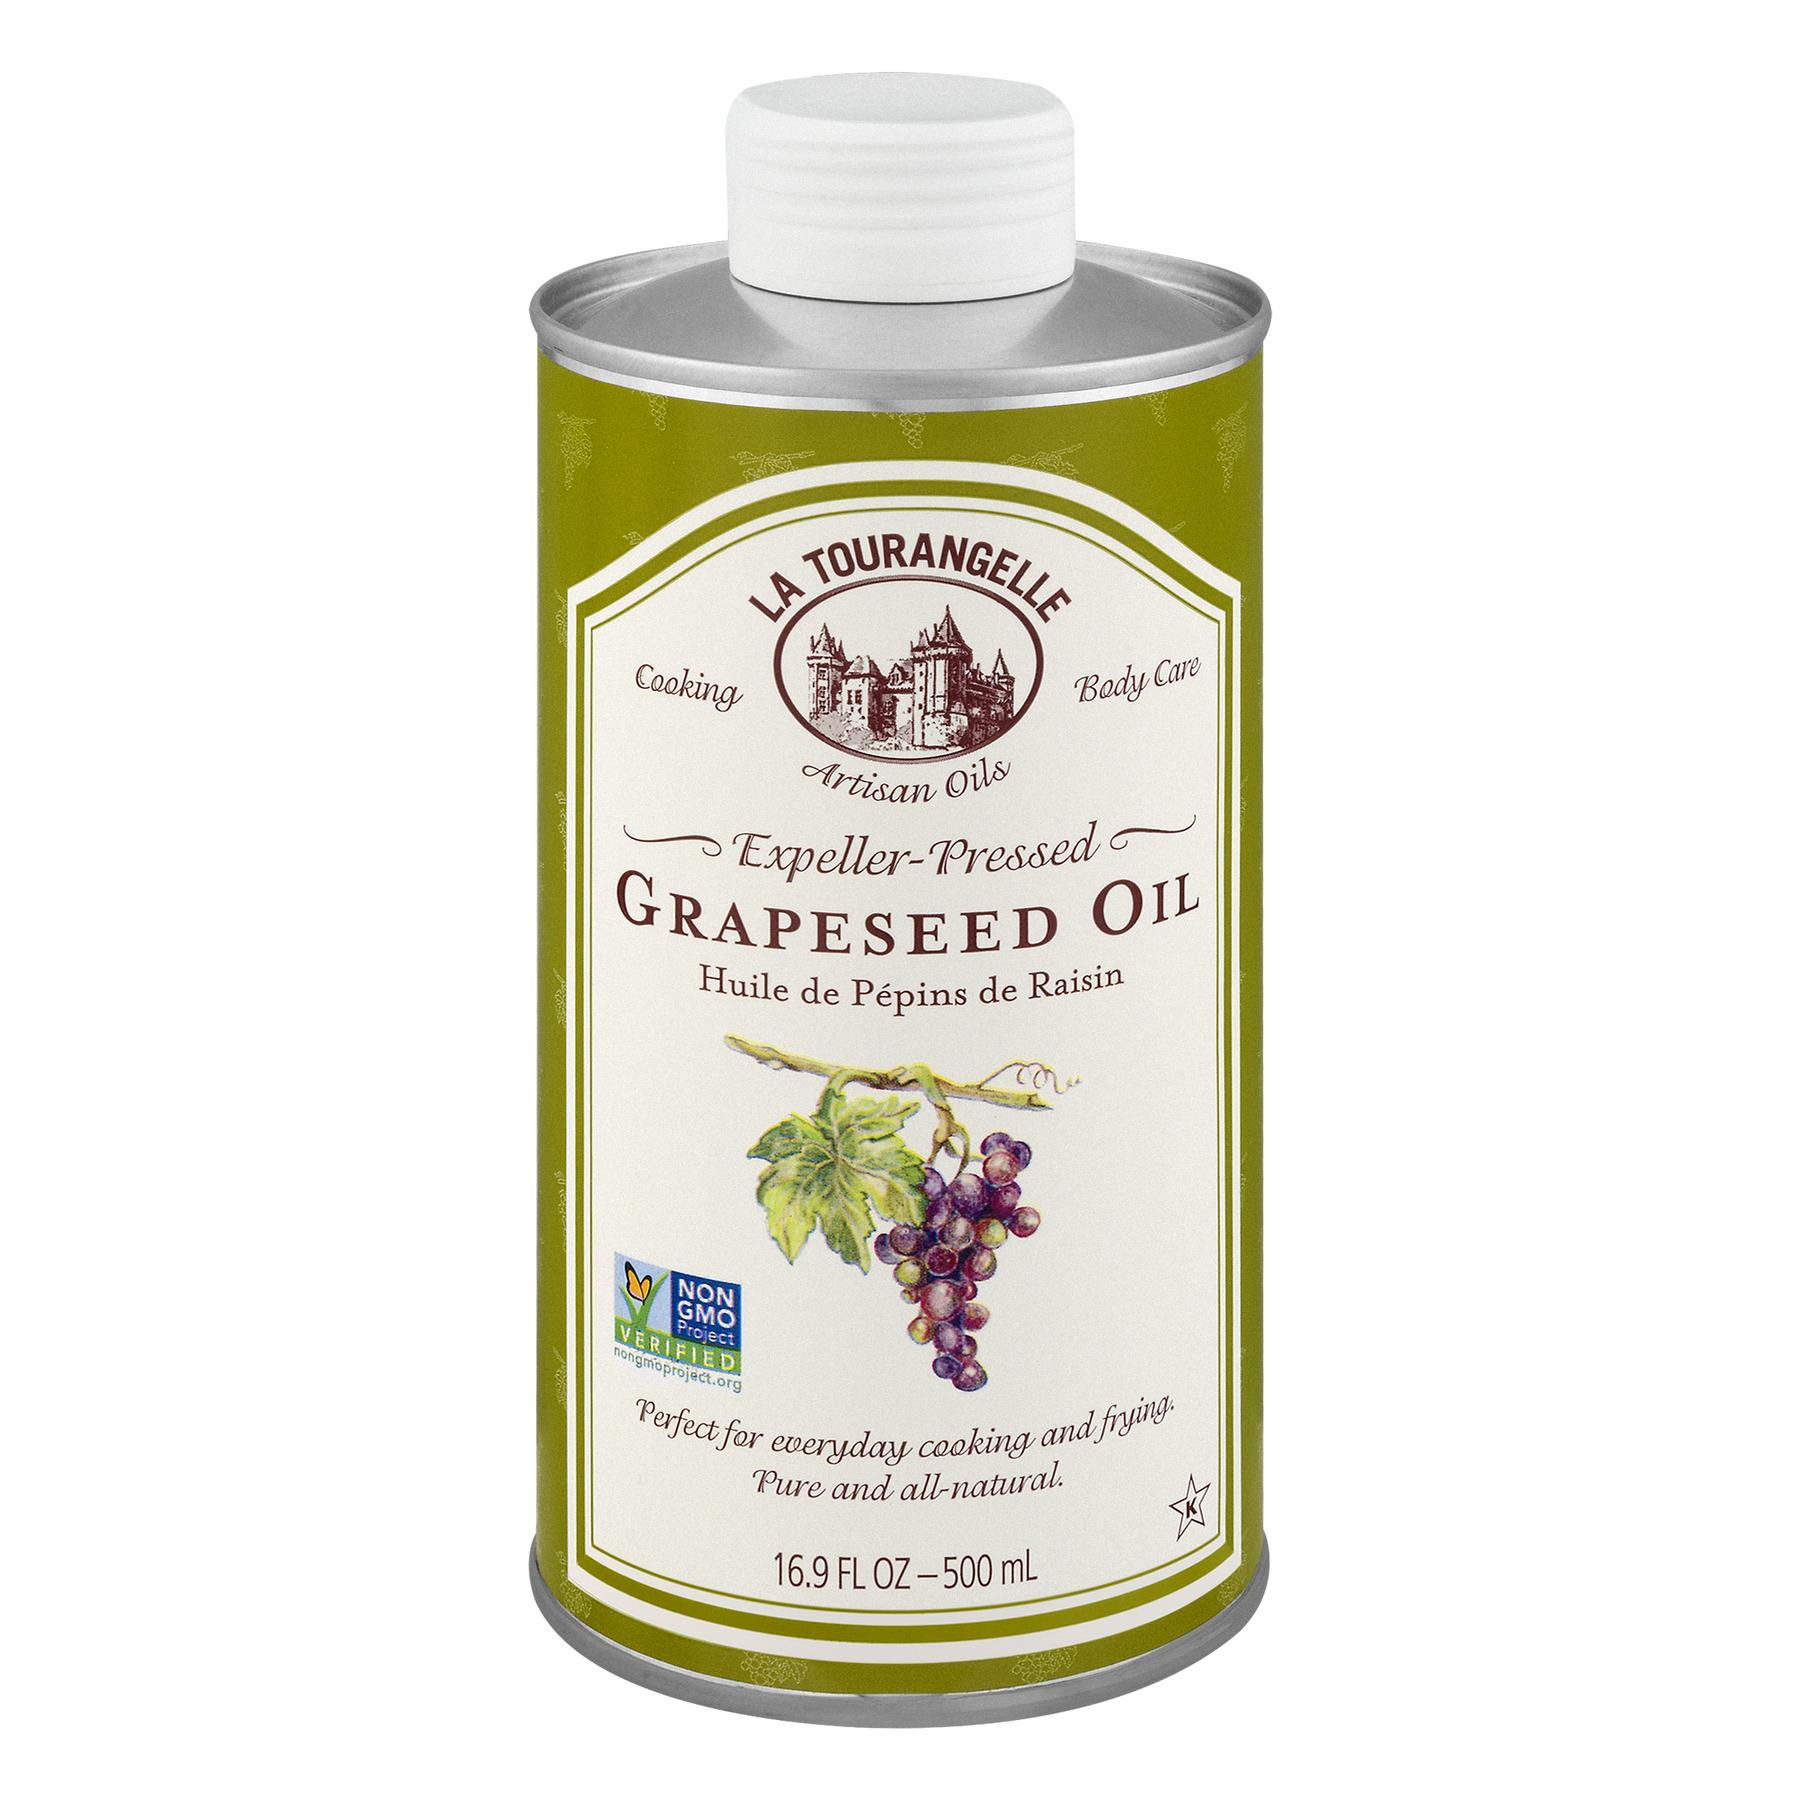 La Tourangelle, Expeller-Pressed Grapeseed Oil, 16.9 fl oz (500 ml)